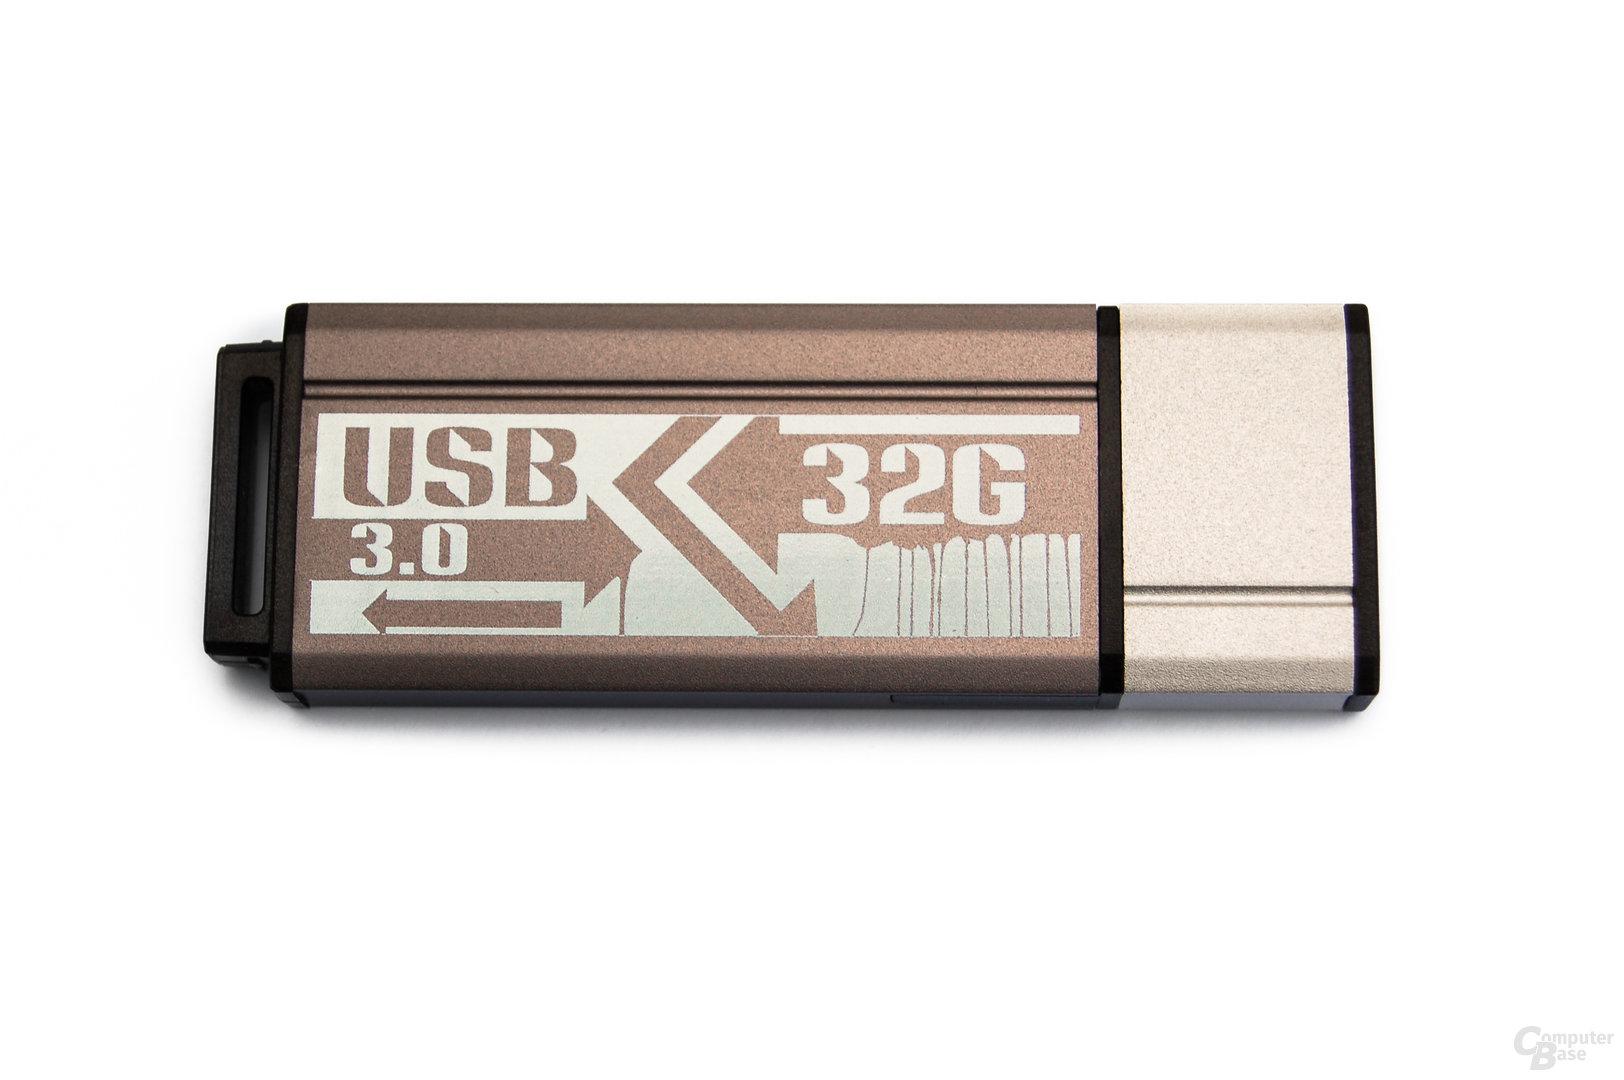 Mach Xtreme Technology FX USB 3.0 Pen